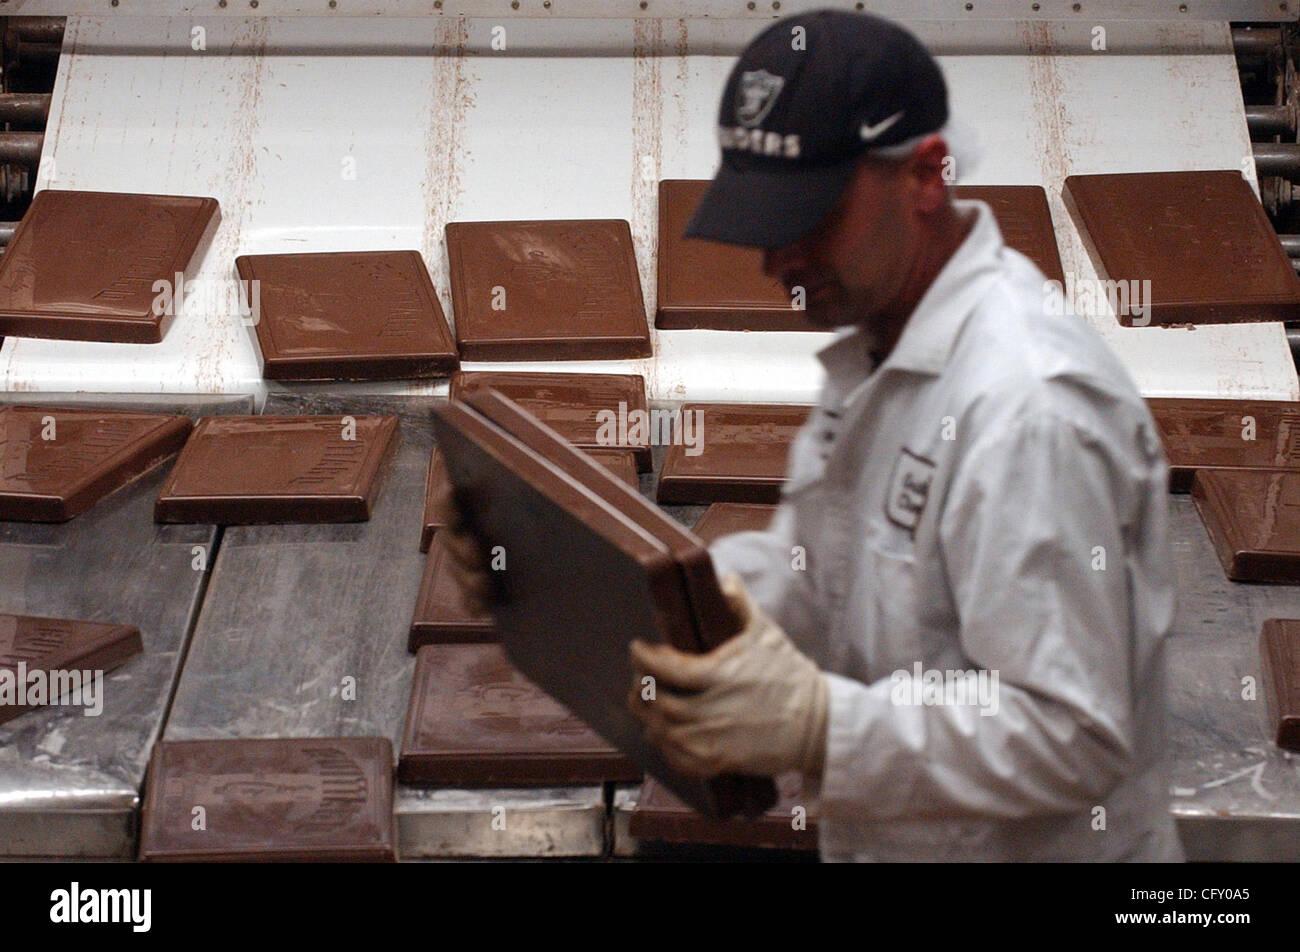 Apr 30, 2007 - Burlingame, CA, USA - Guittard Chocolate Company ...